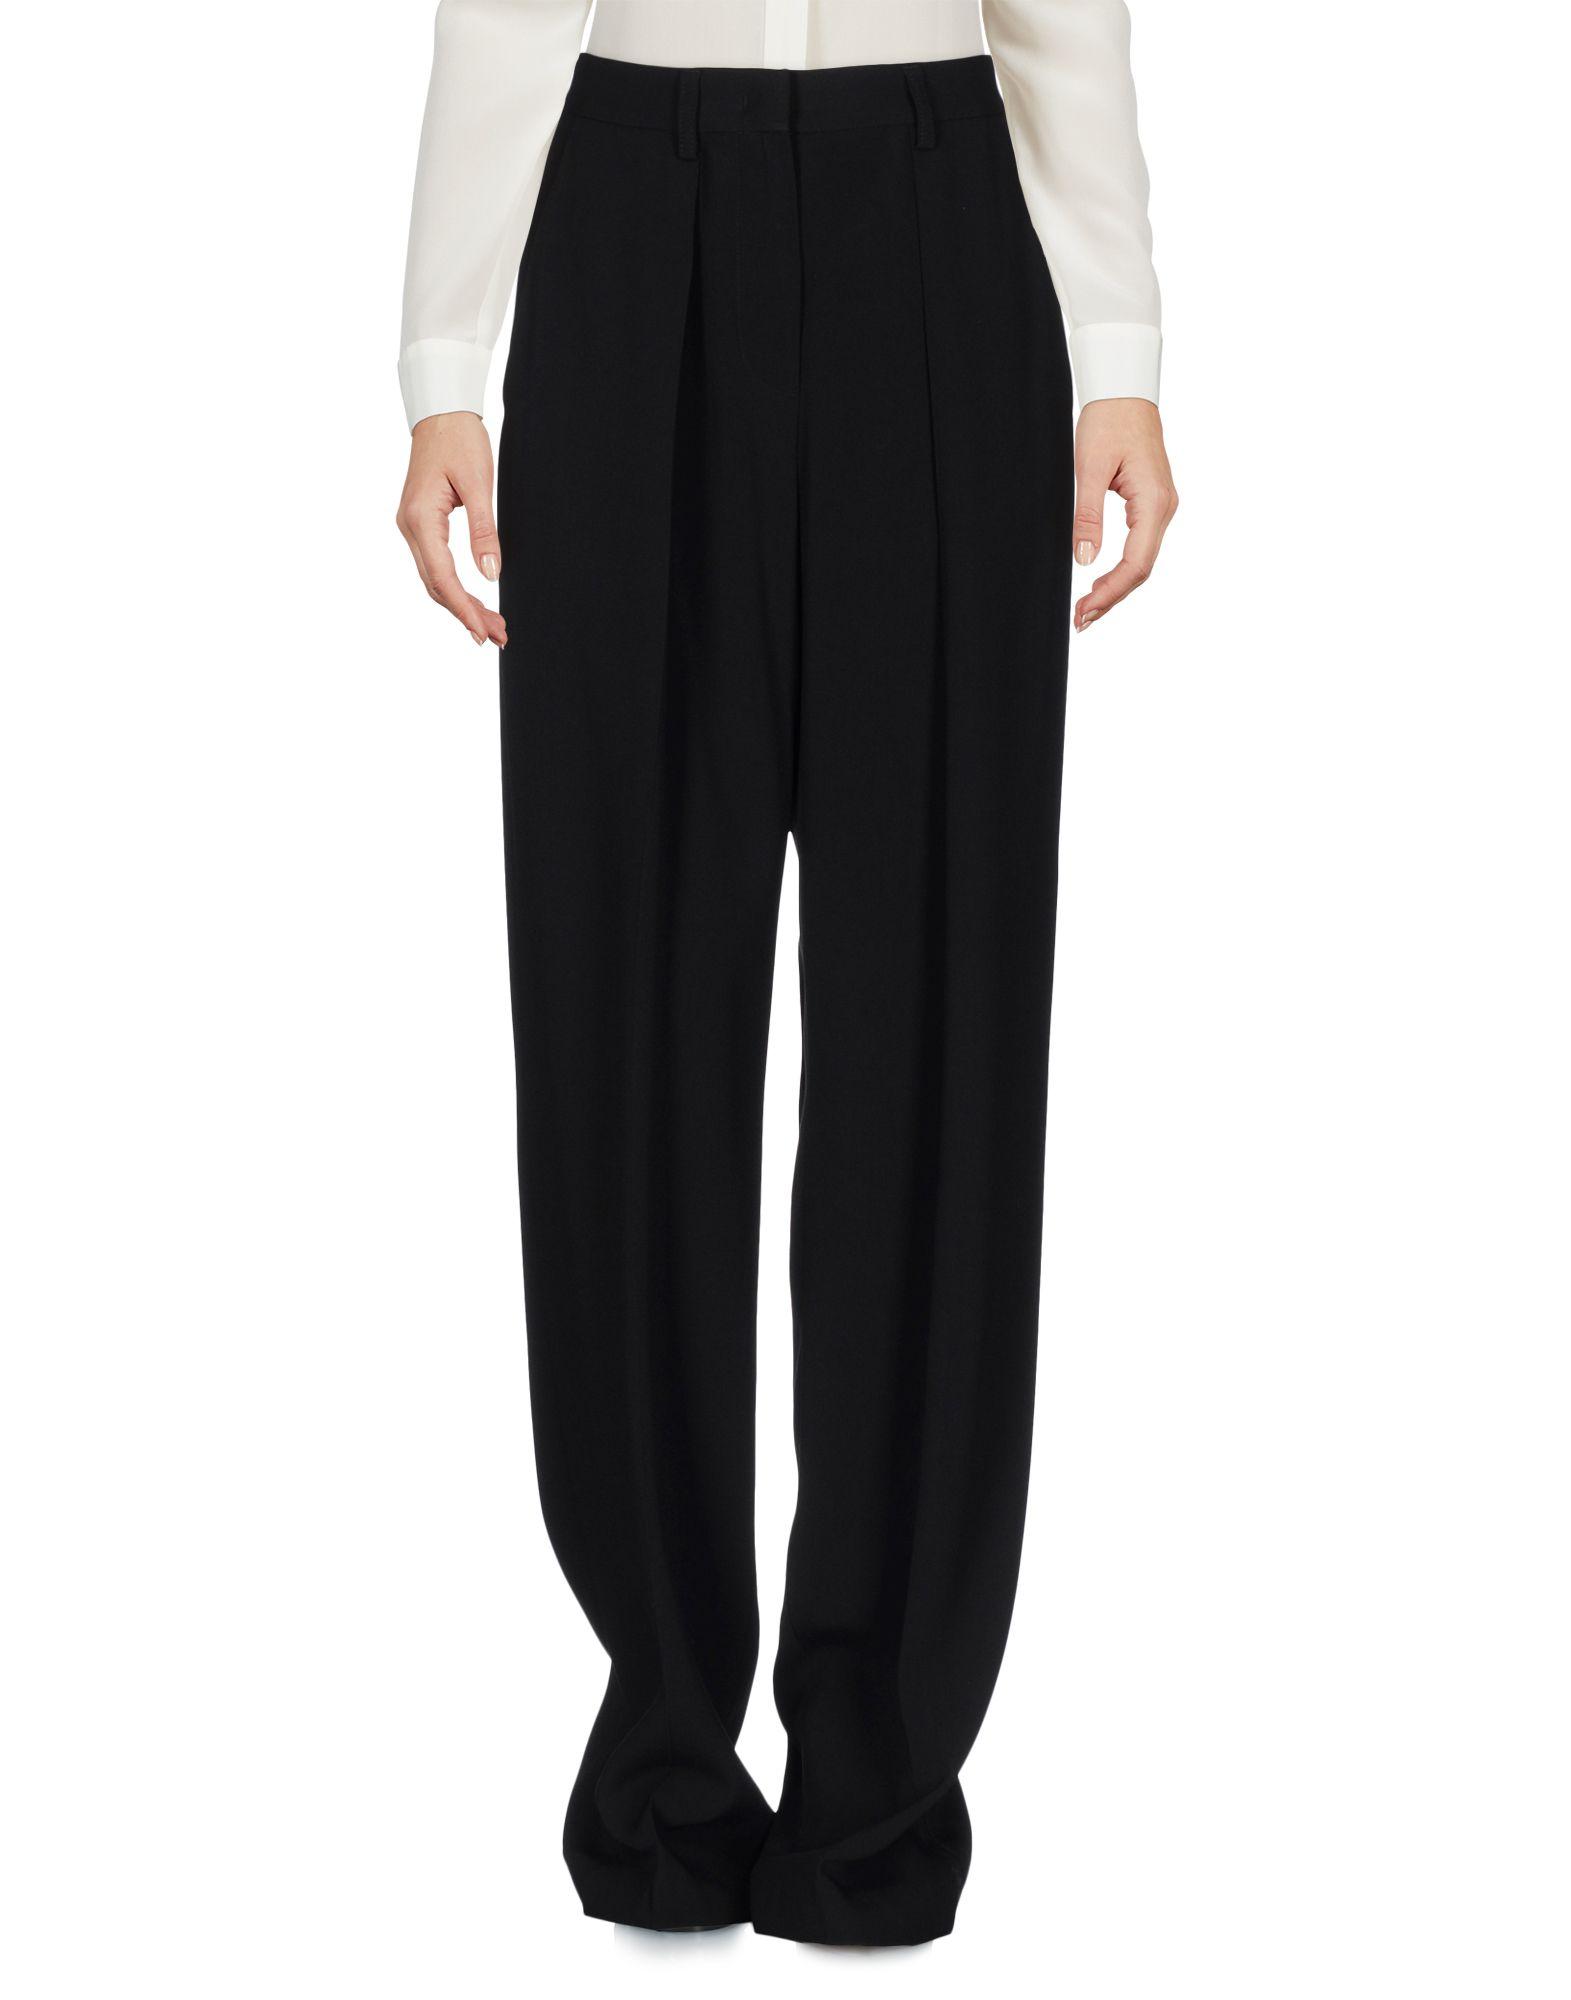 Pantalone Msgm Donna - Acquista online su oQxWL5cTq